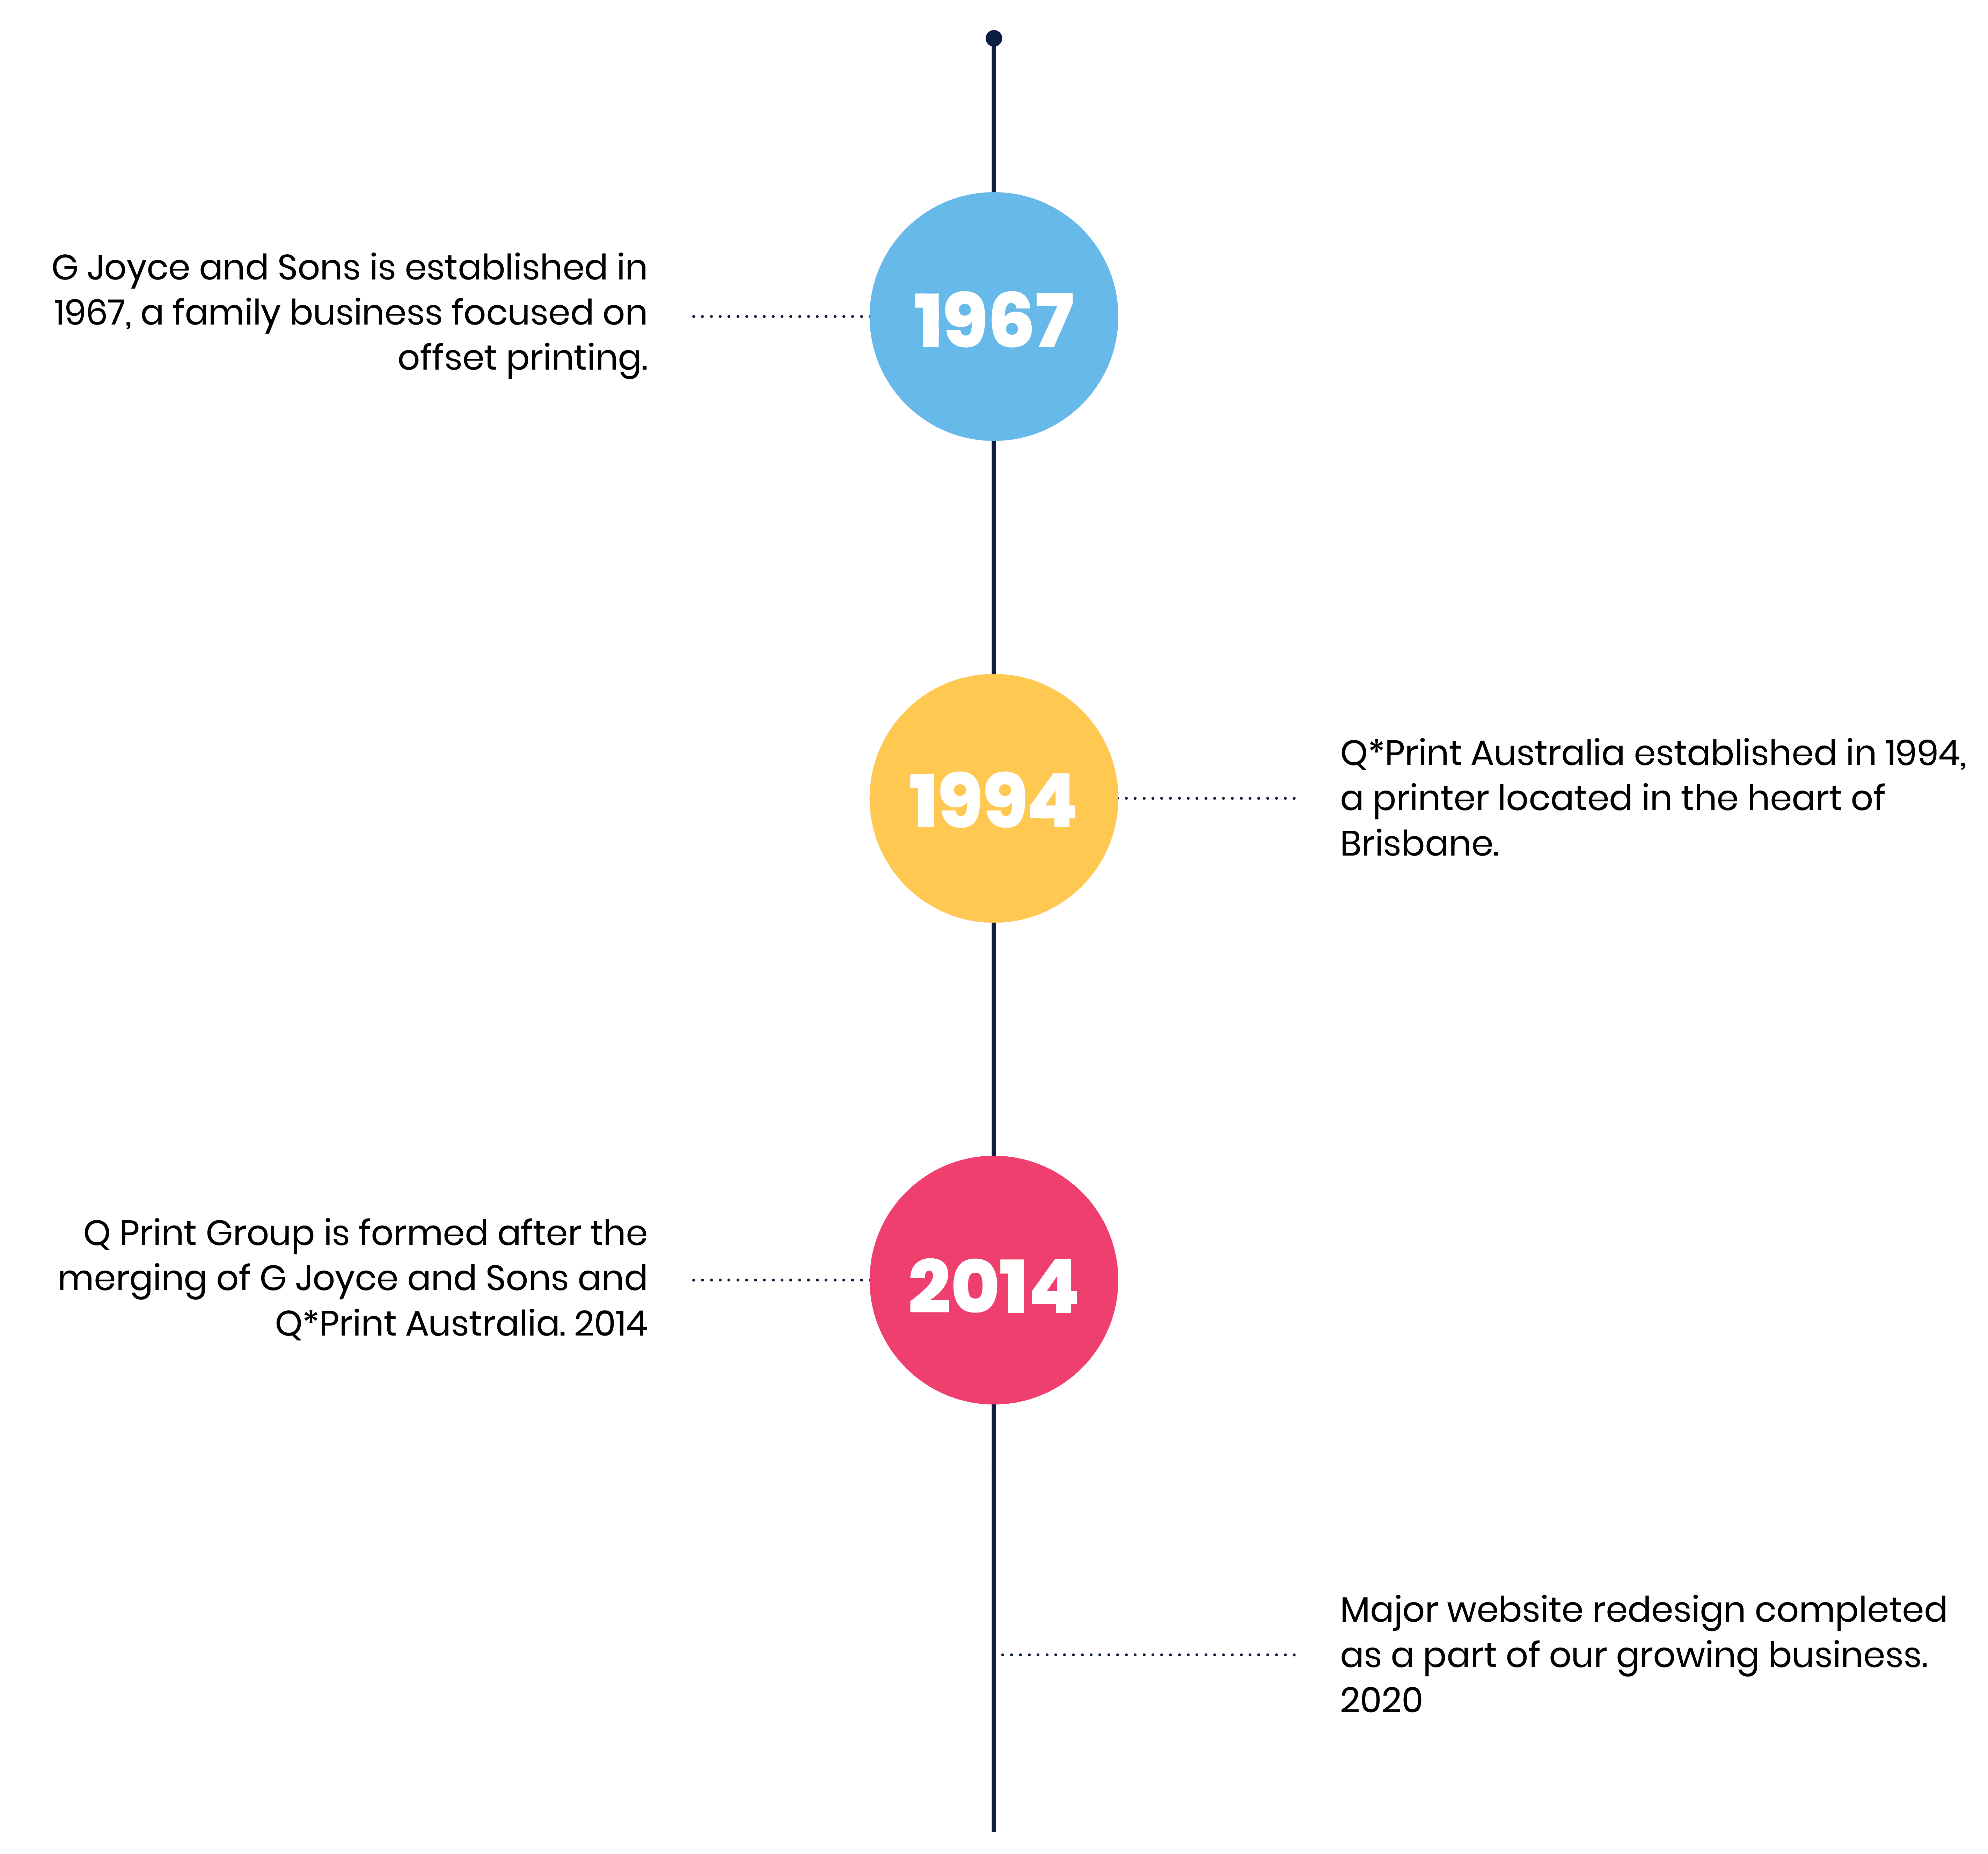 History of Q Print